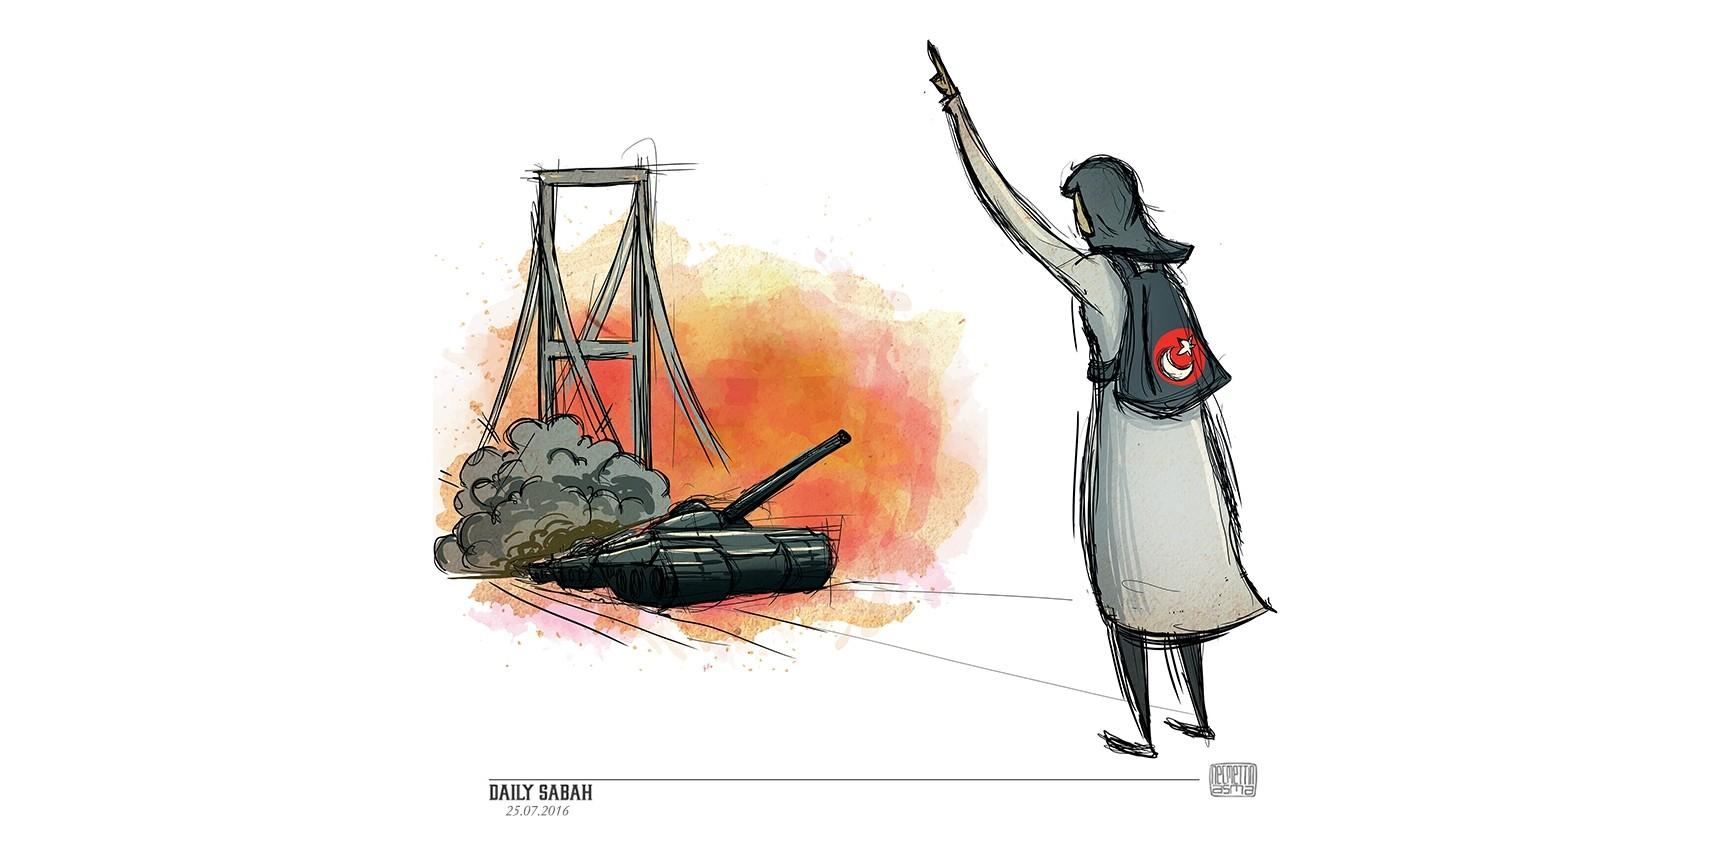 Safiye Bayat stood up against the Gu00fclenist coup plotters on Istanbul's Bosporus Bridge on July 15 and was injured by their shootings. (Illustration by Necmettin Asma - twitter.com/necmettinasma)